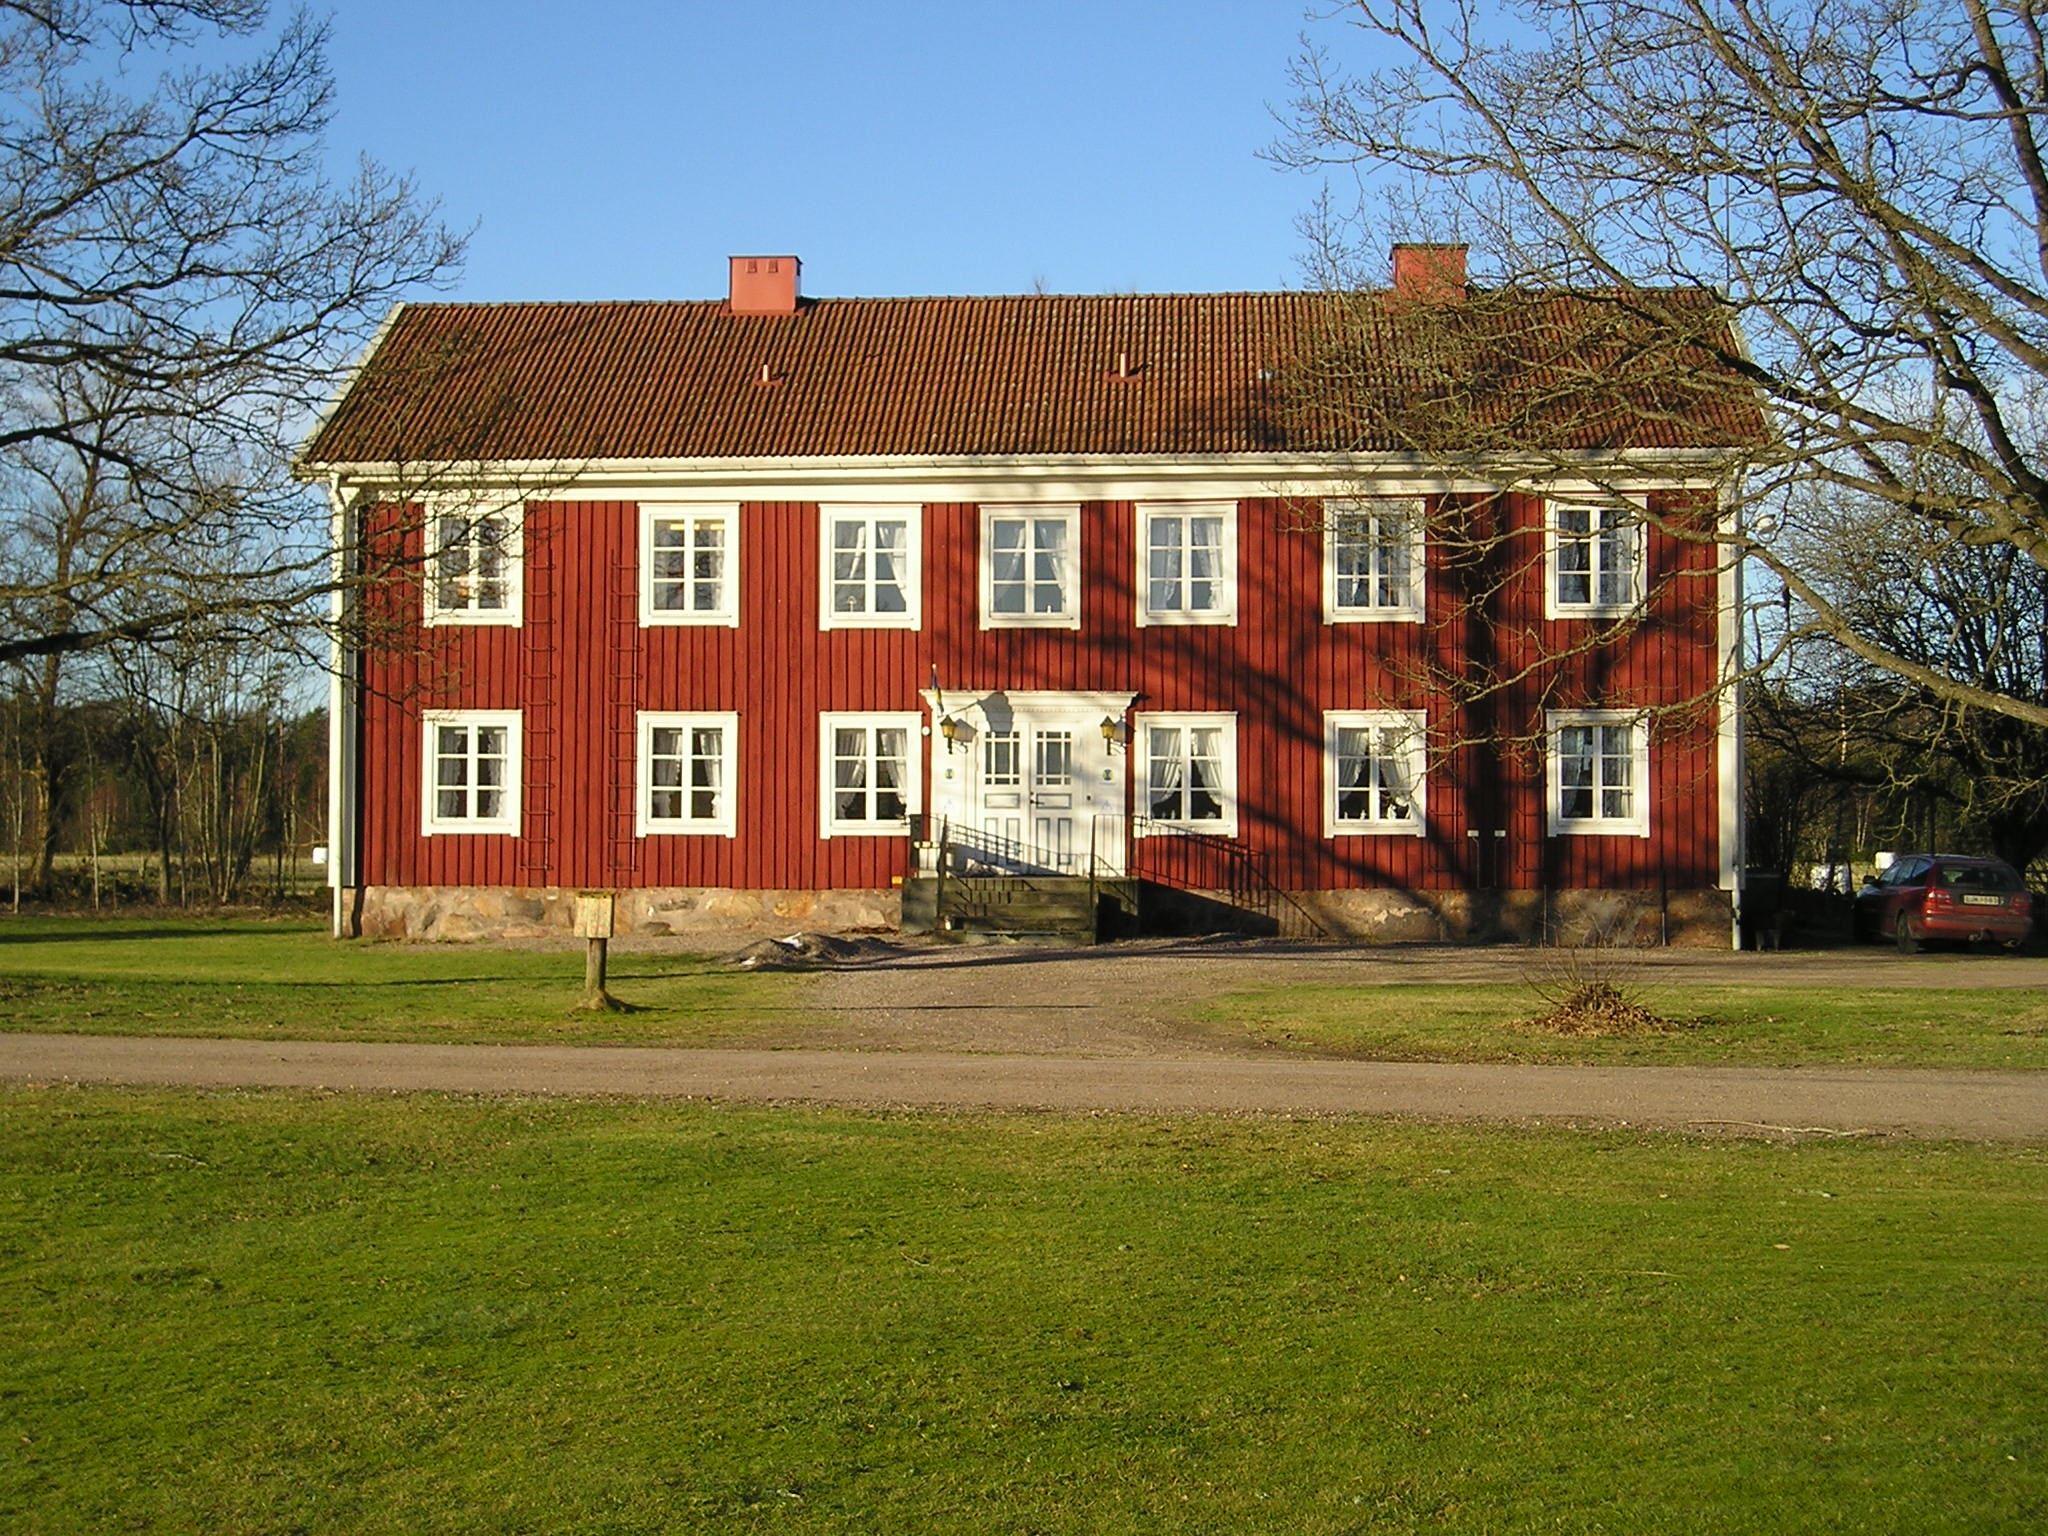 Södra Ljunga Vandrarhem